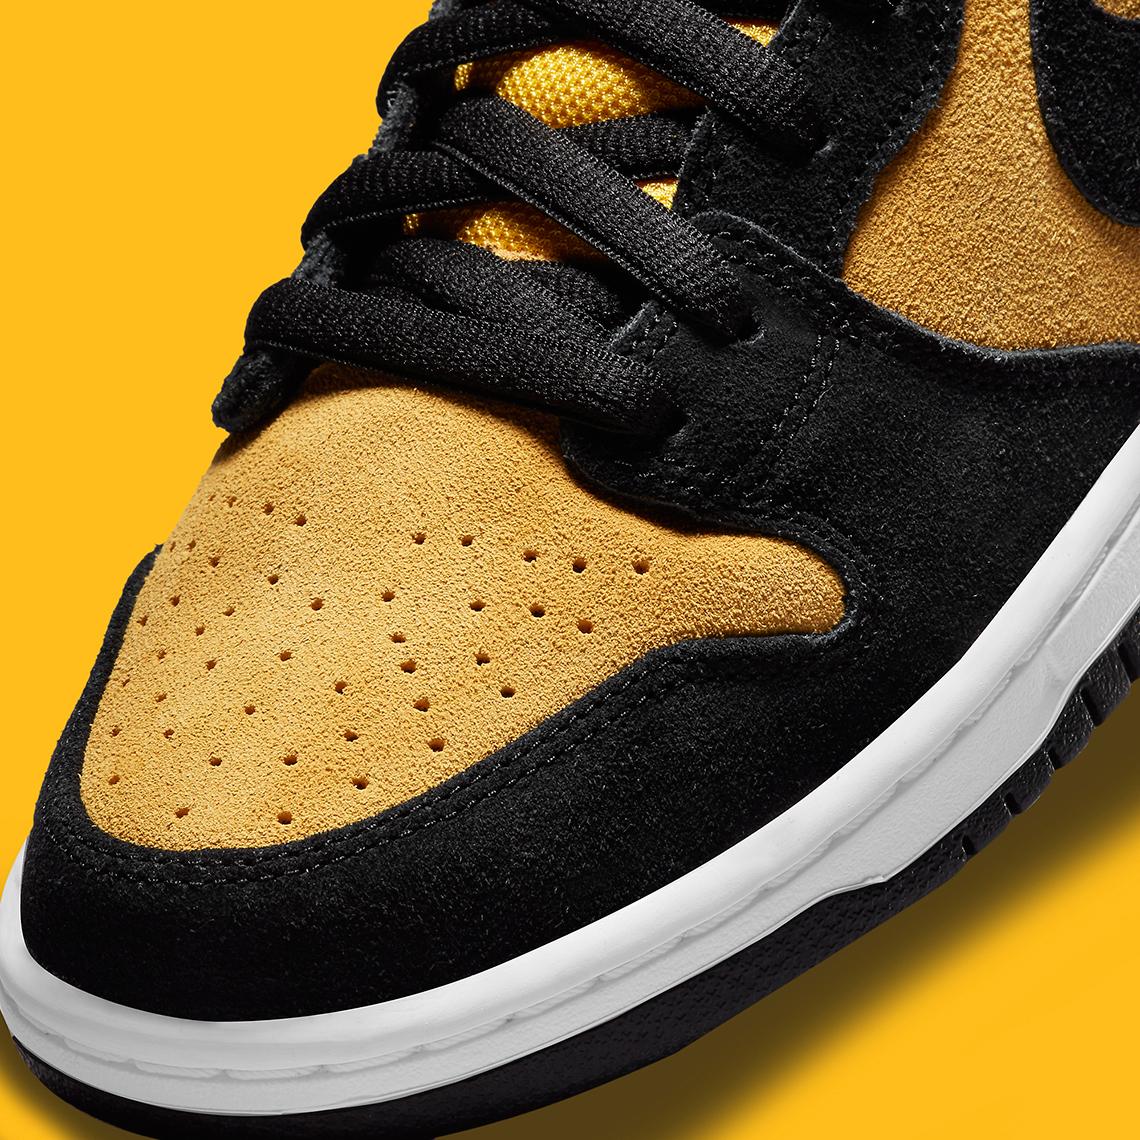 Nike SB Dunk High Pro ''Reverse Iowa'' - DB1640-001